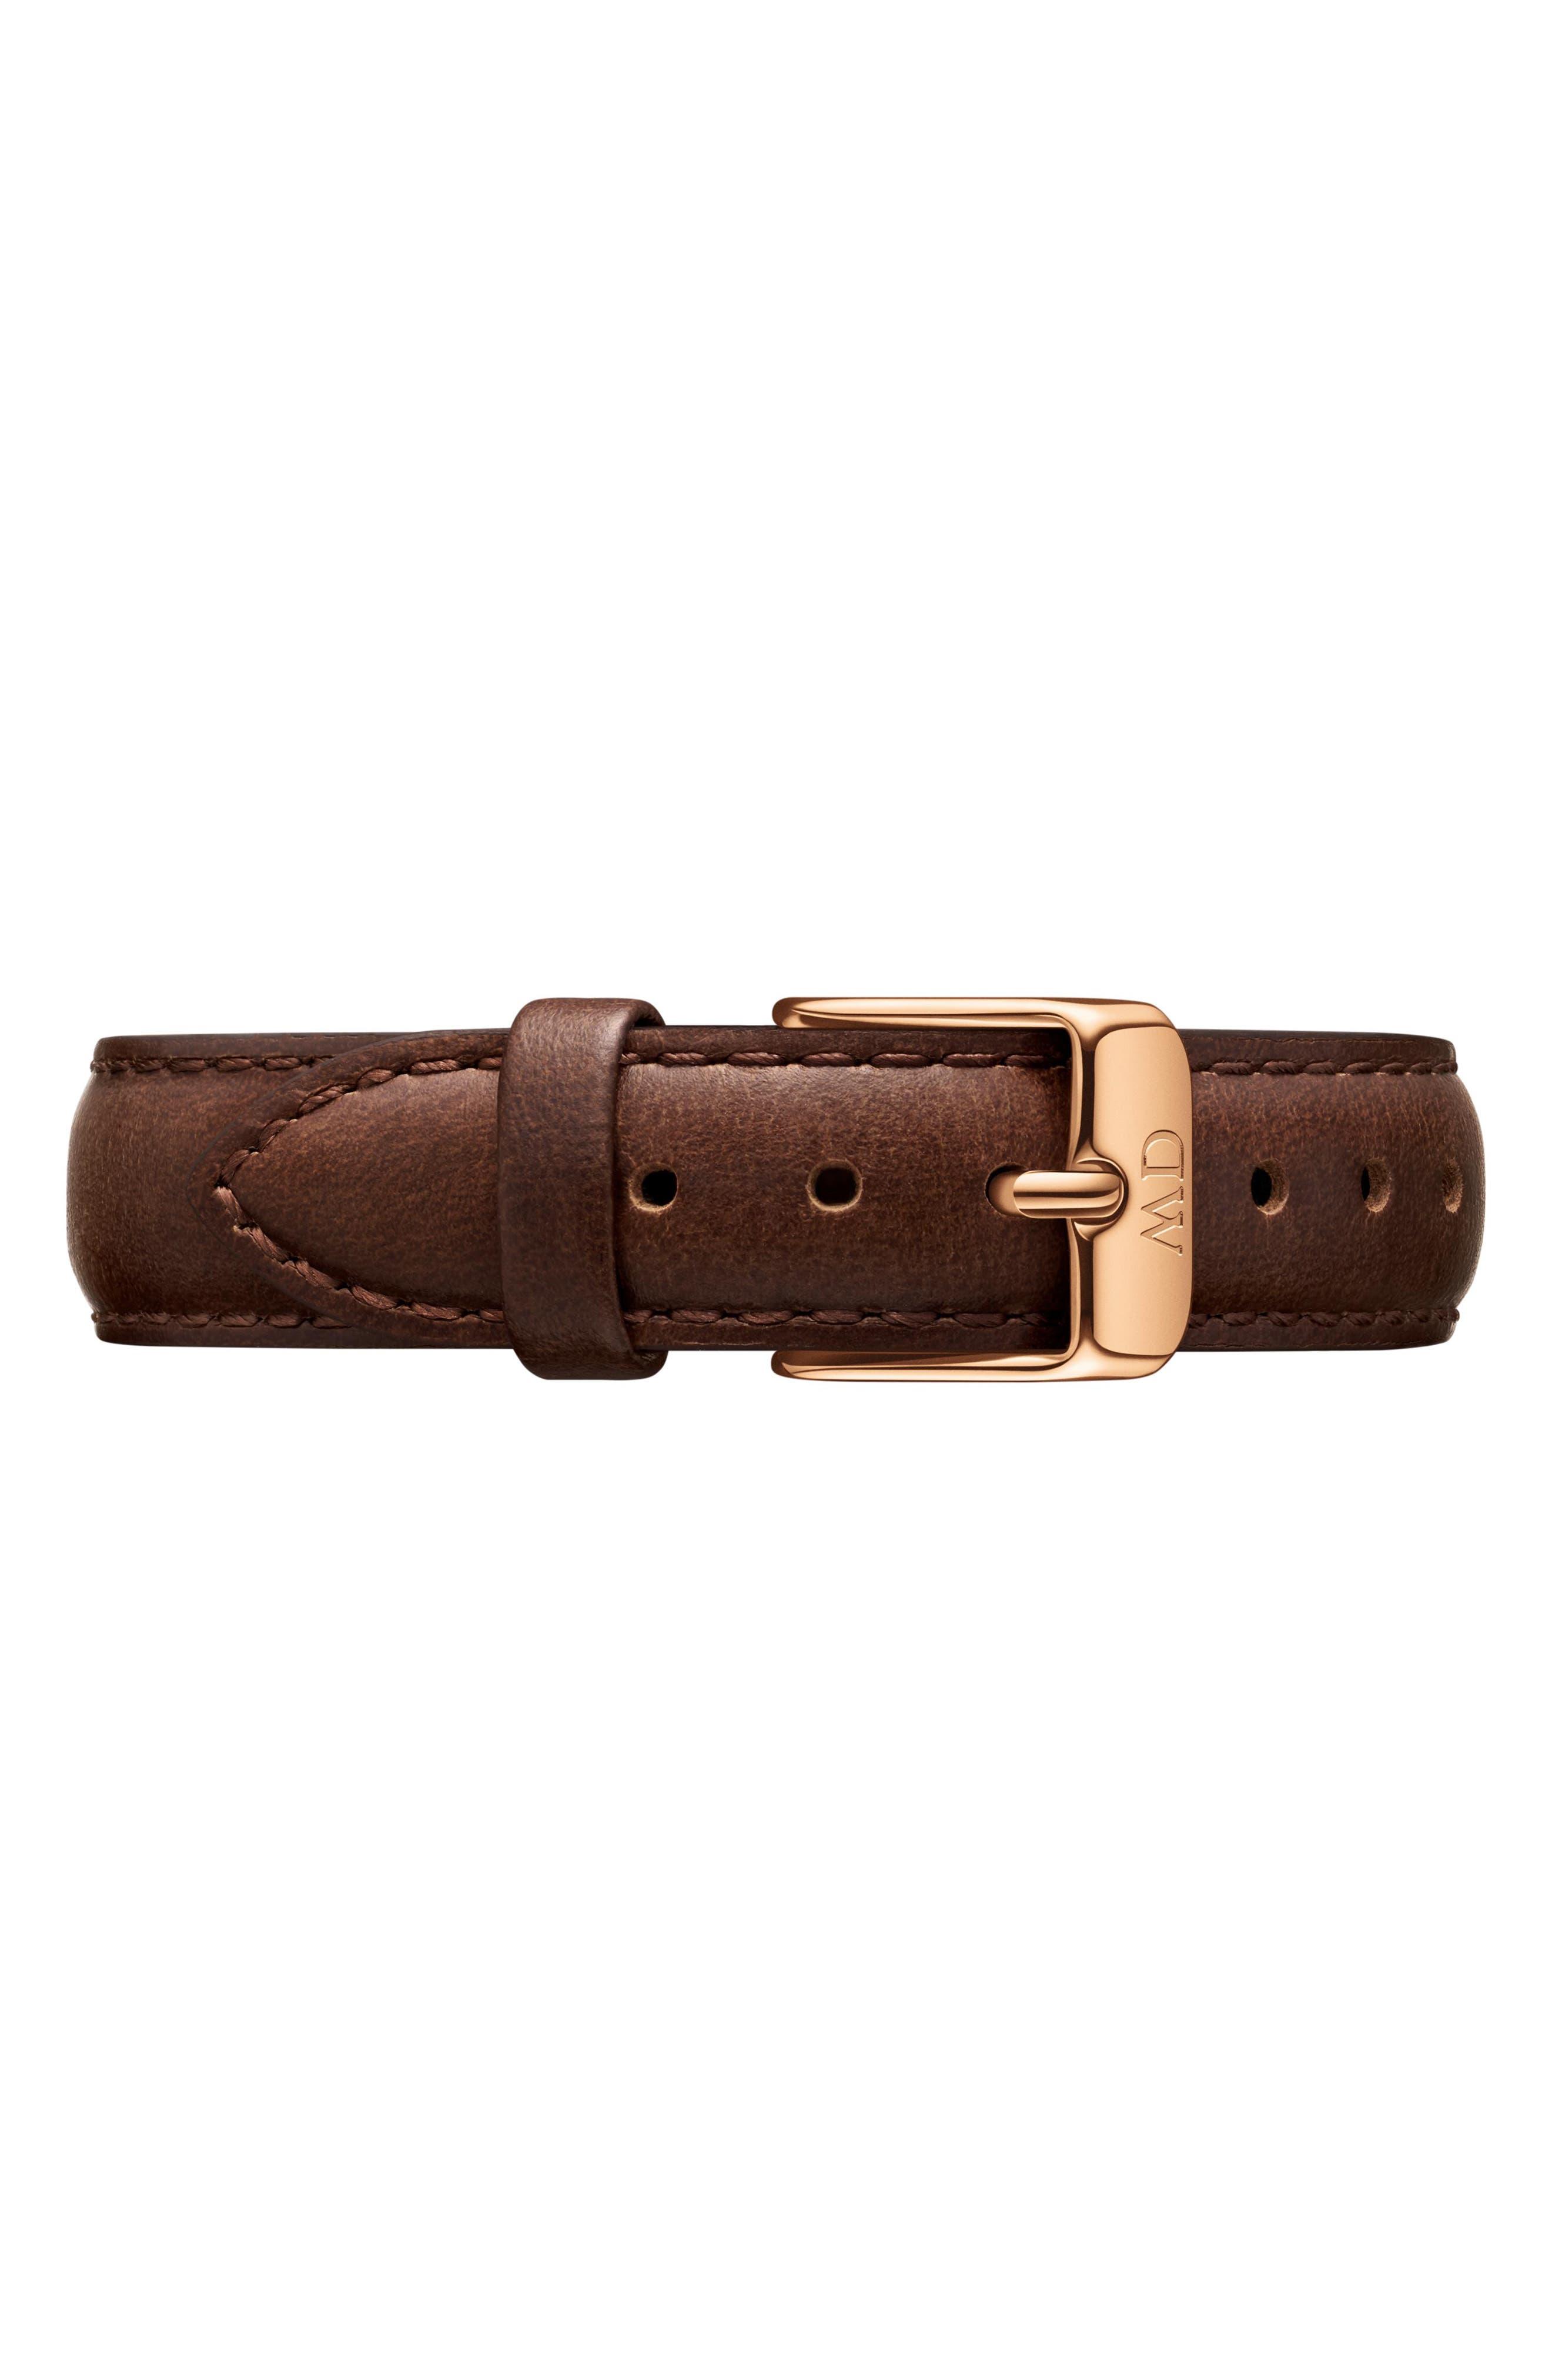 14mm Petite Bristol Leather Watch Band